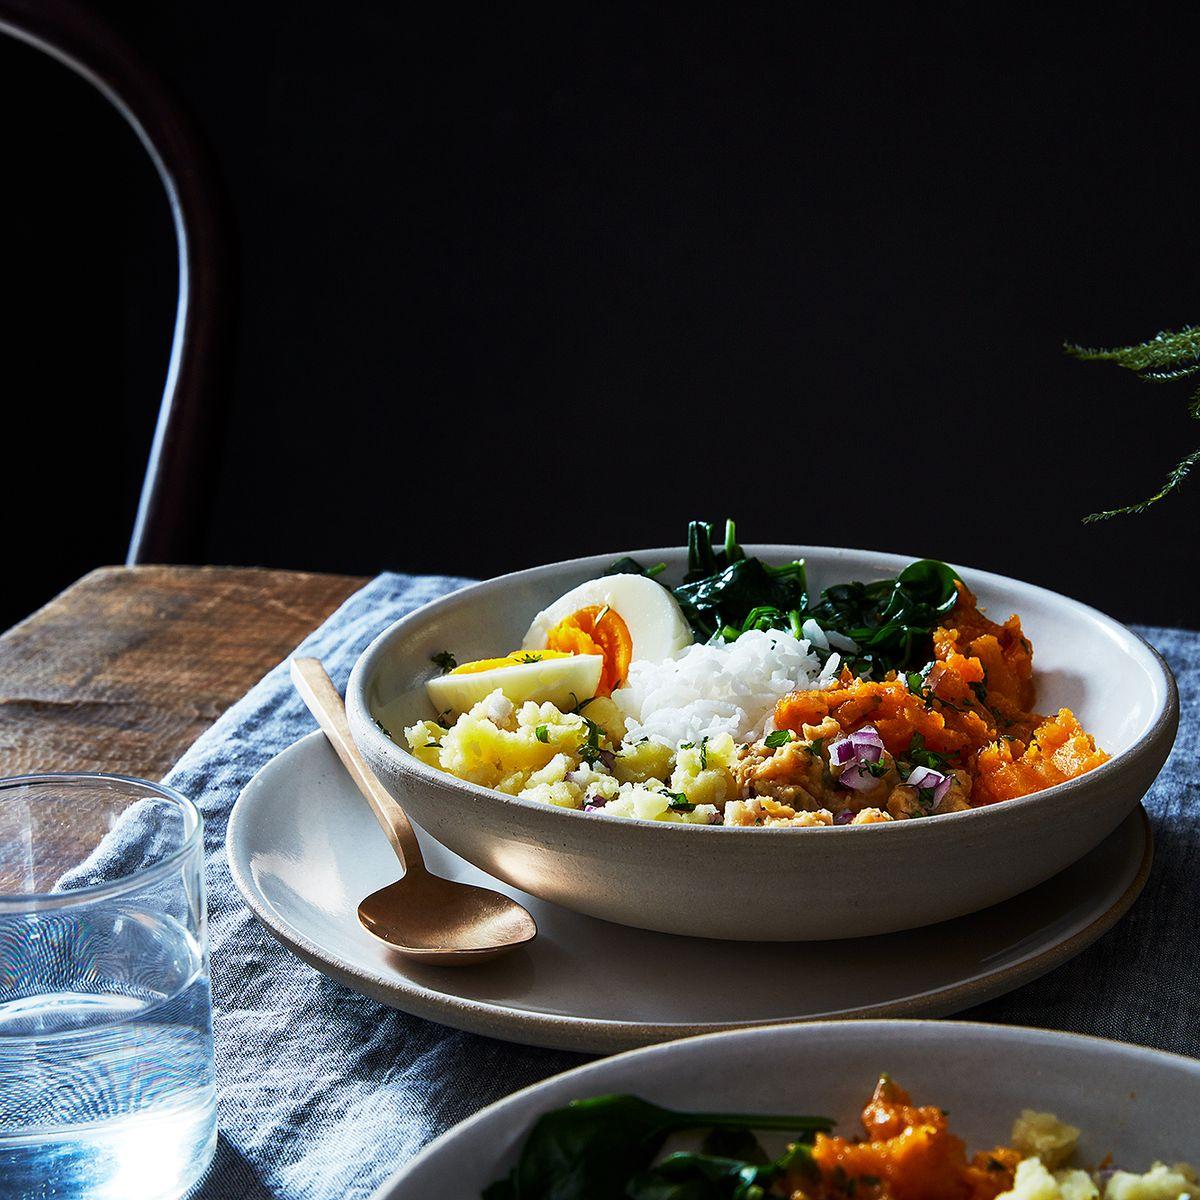 Bhaate bhaat bengali comfort food recipe forumfinder Choice Image